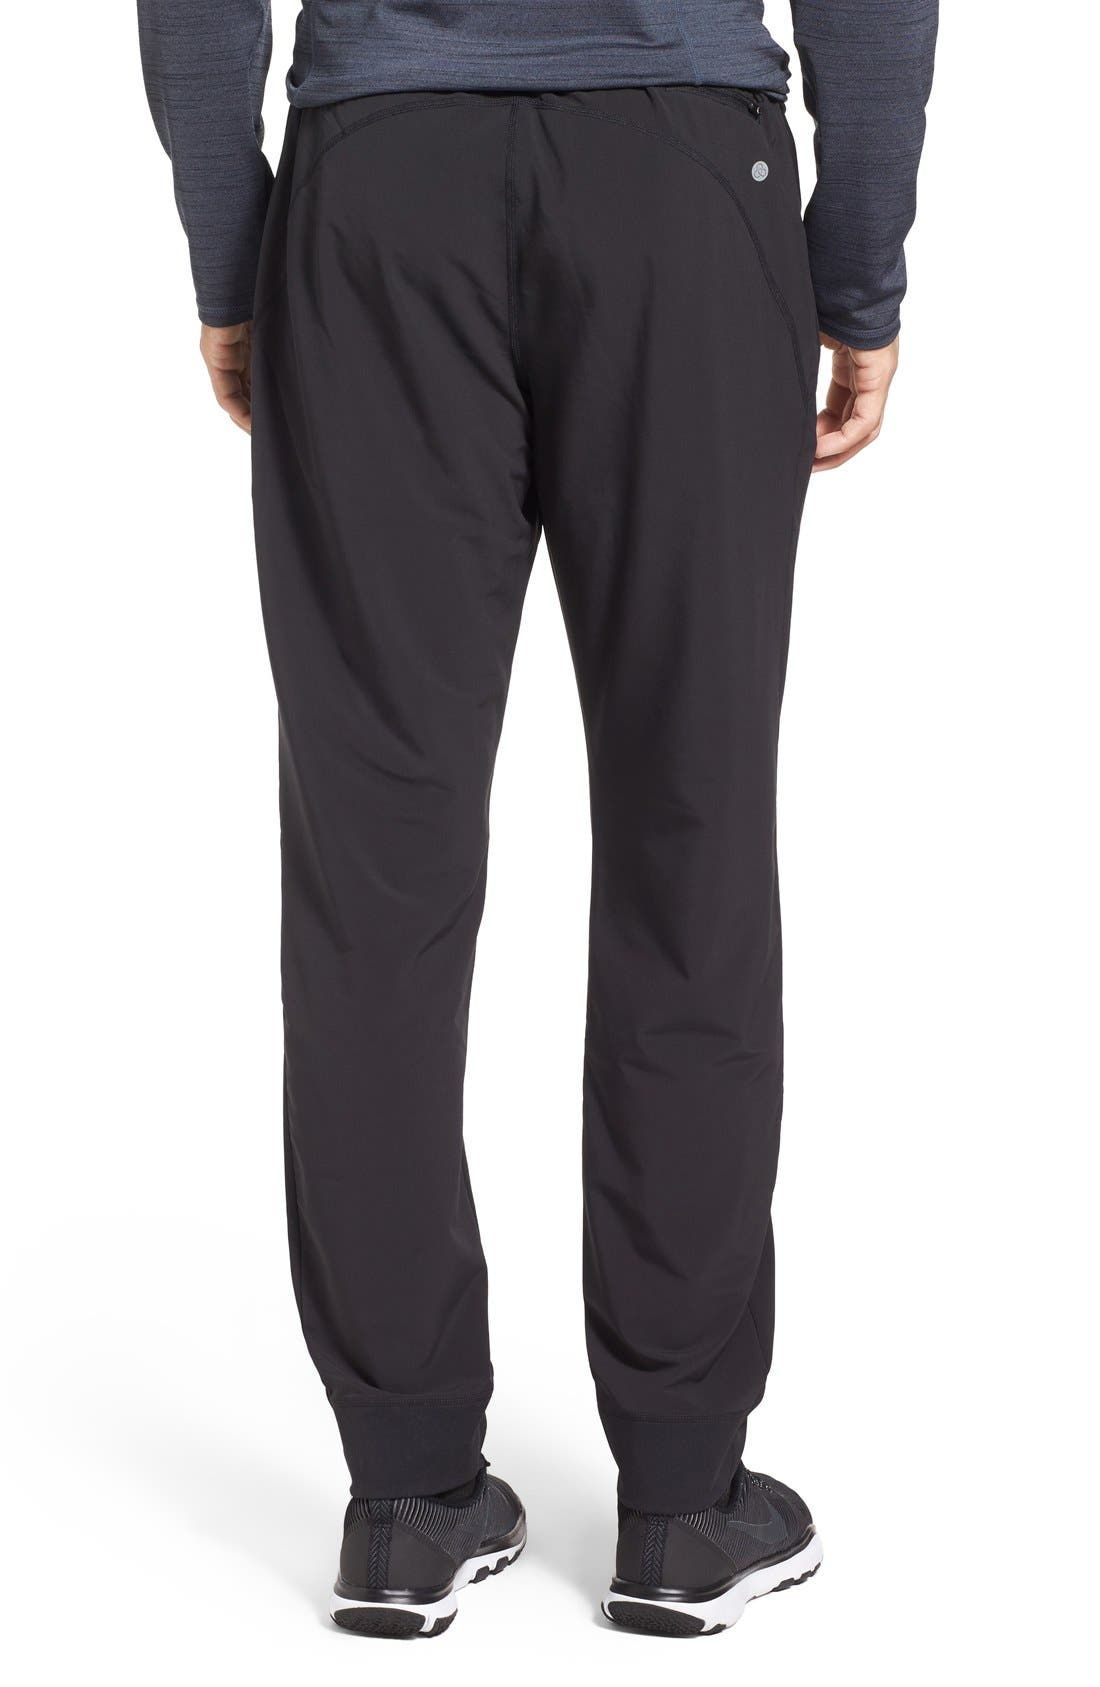 Alternate Image 2  - Zella 'Graphite' Tapered Athletic Pants